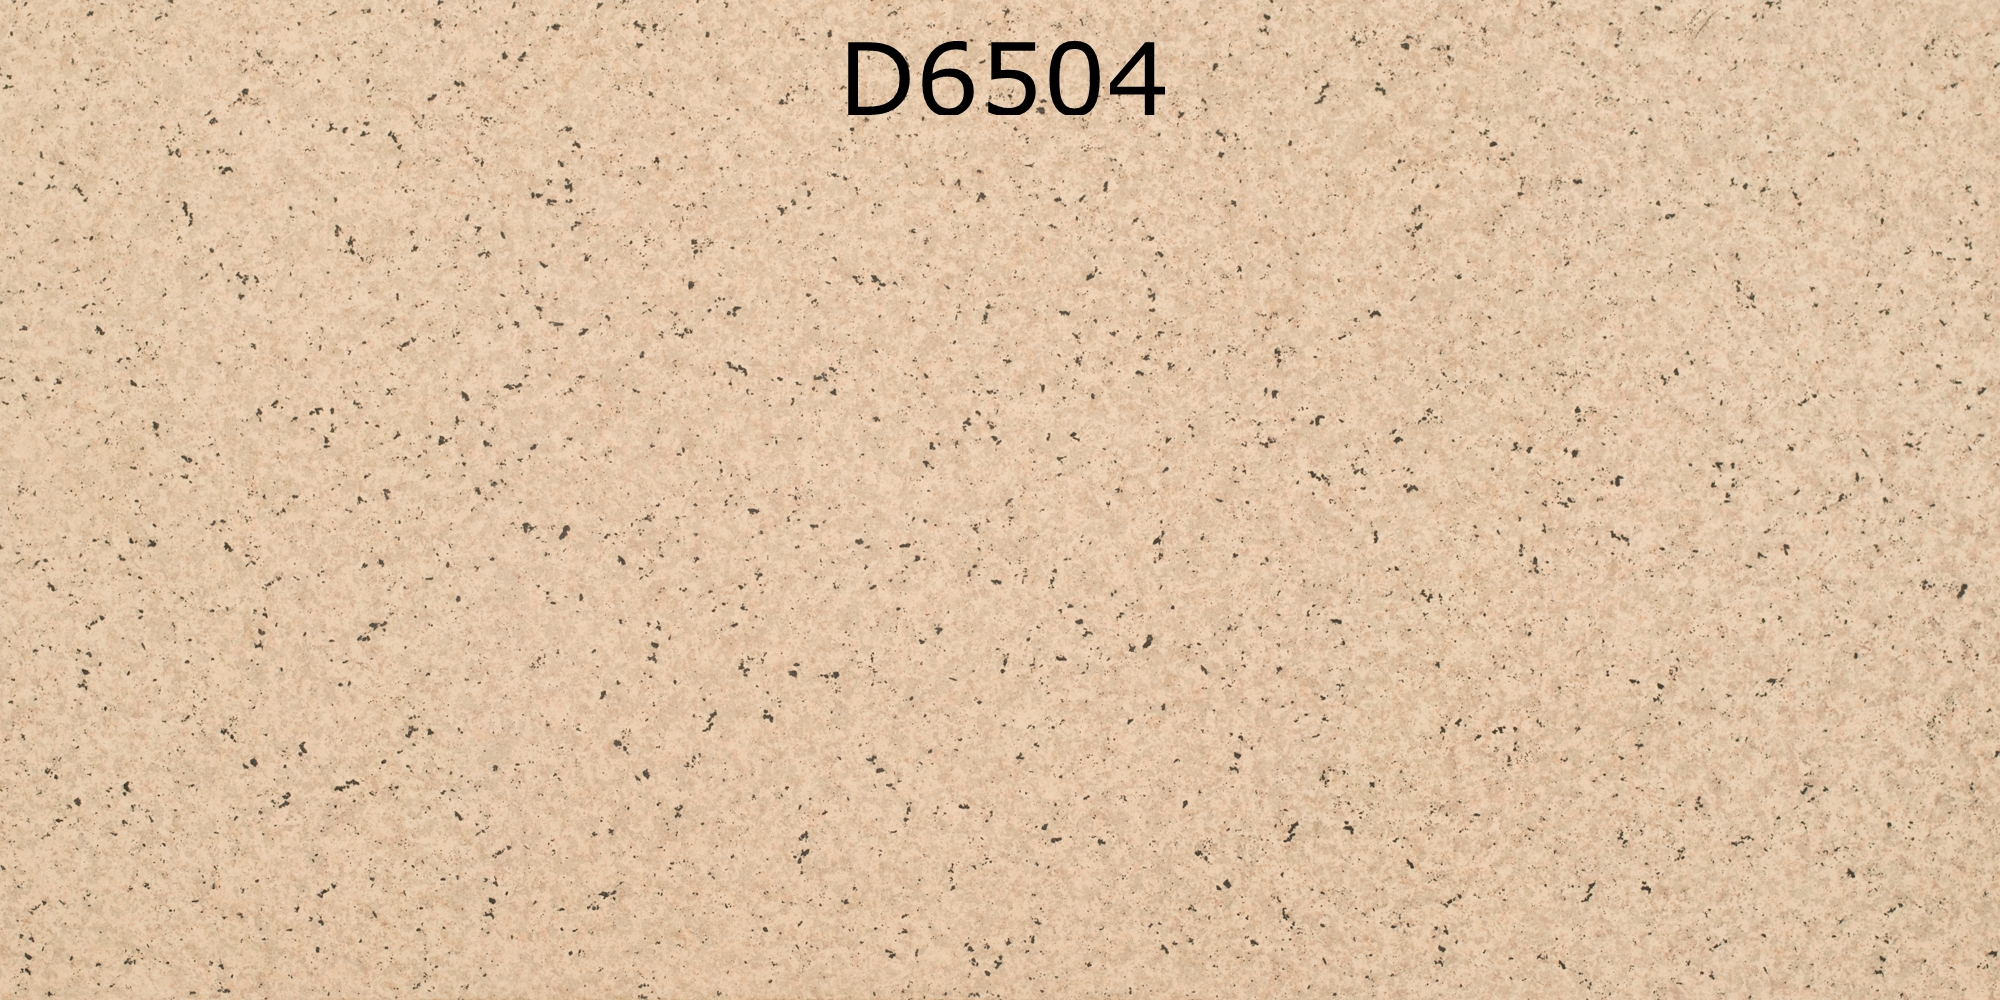 D6504